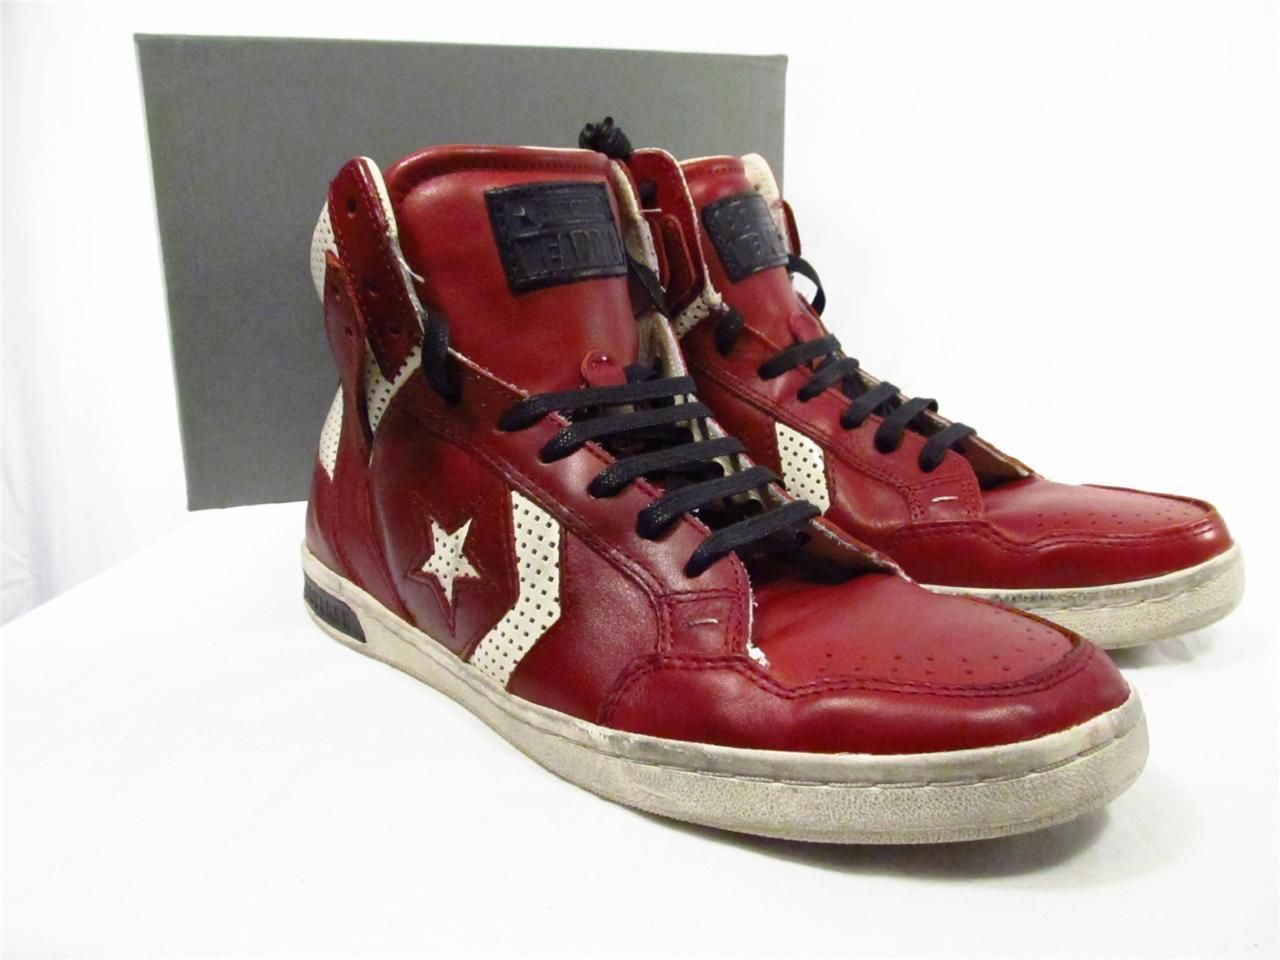 2391c3e0d8e8 ... jv weapon mid shoe sneaker leather faded rose 136683c ebay fcc61 573b0  where to buy converse 150164c john varvatos ct hi dril beige men shoes 10  ...